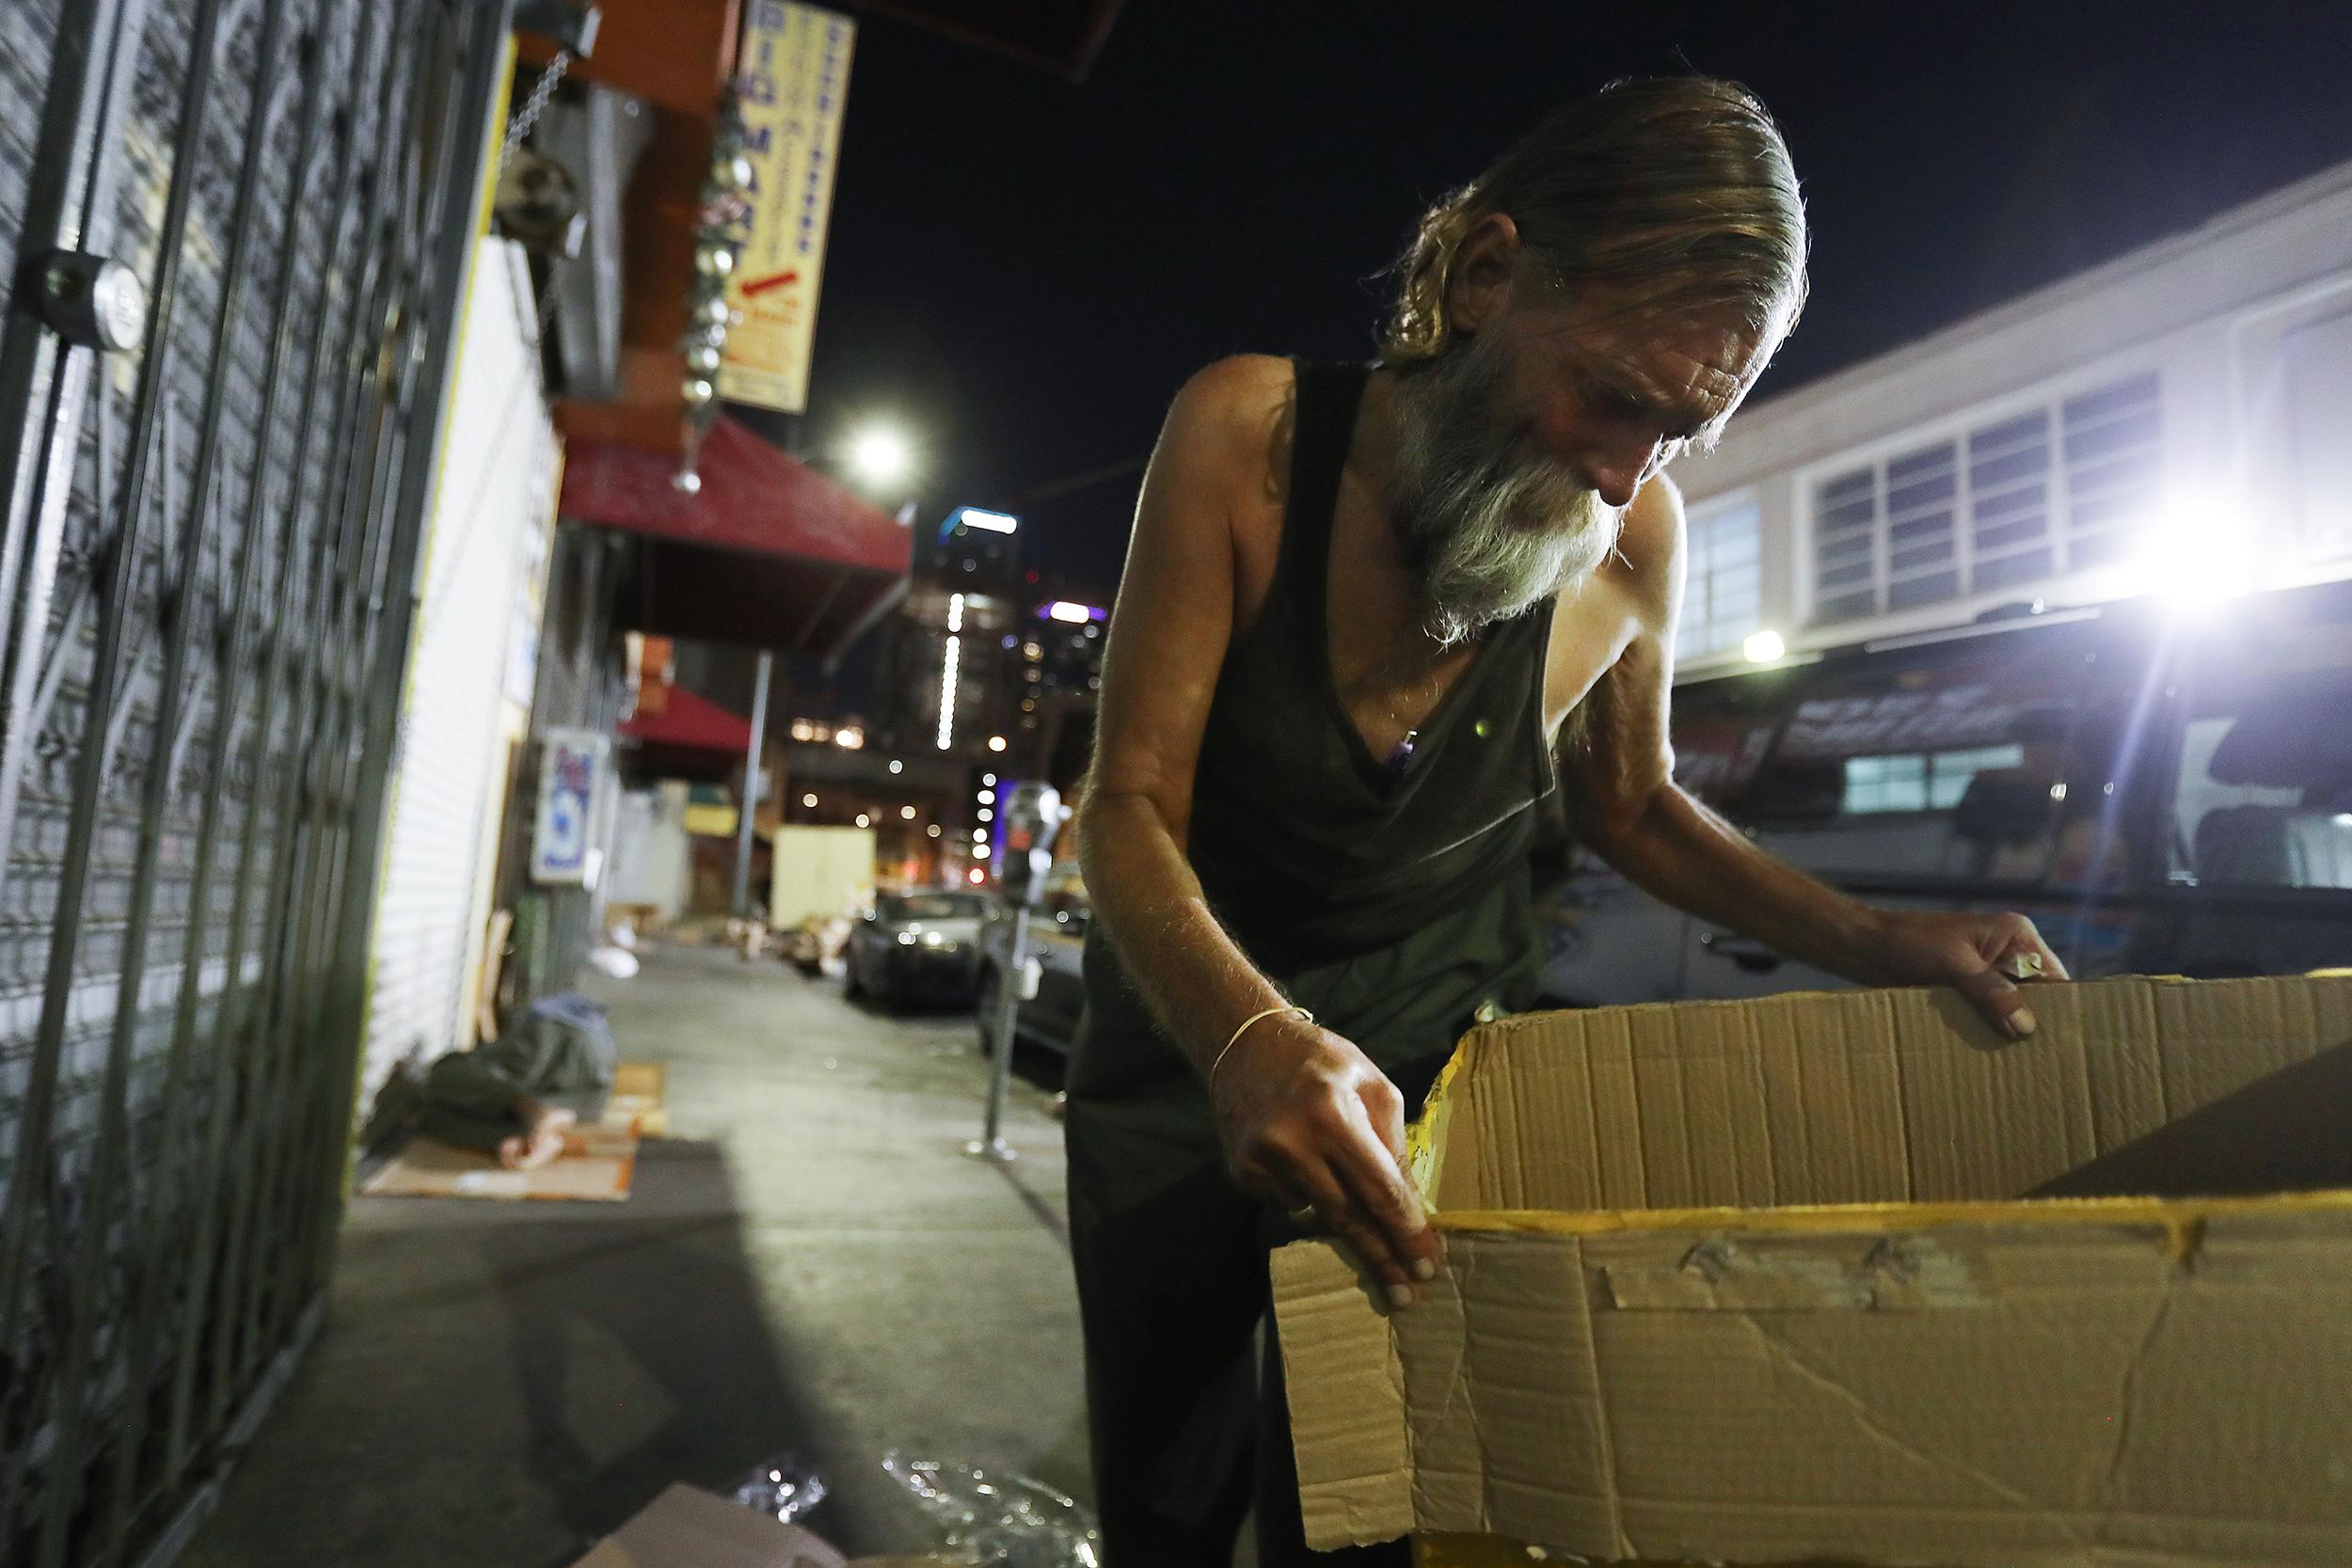 HUD estimates 2.7 percent rise in U.S. homelessness due to California housing crisis - Firenews